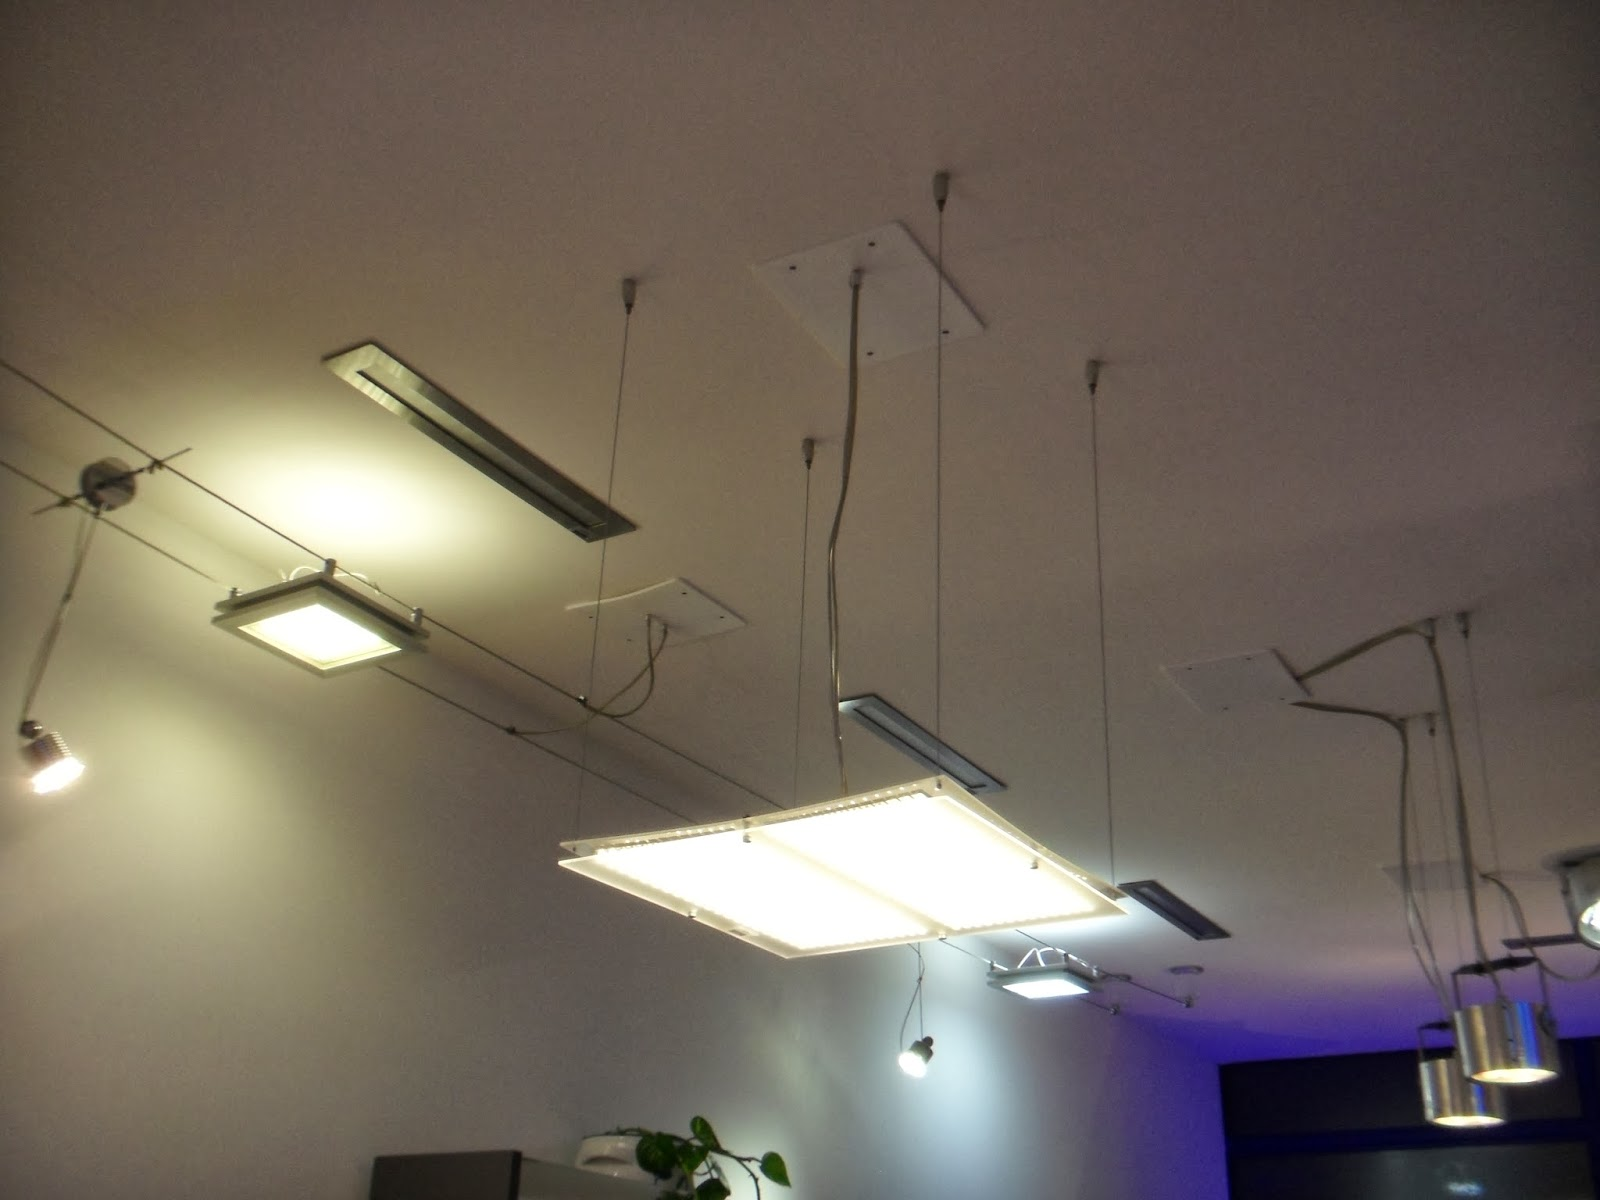 Faretti led per scale interne cheap case scala interna led per